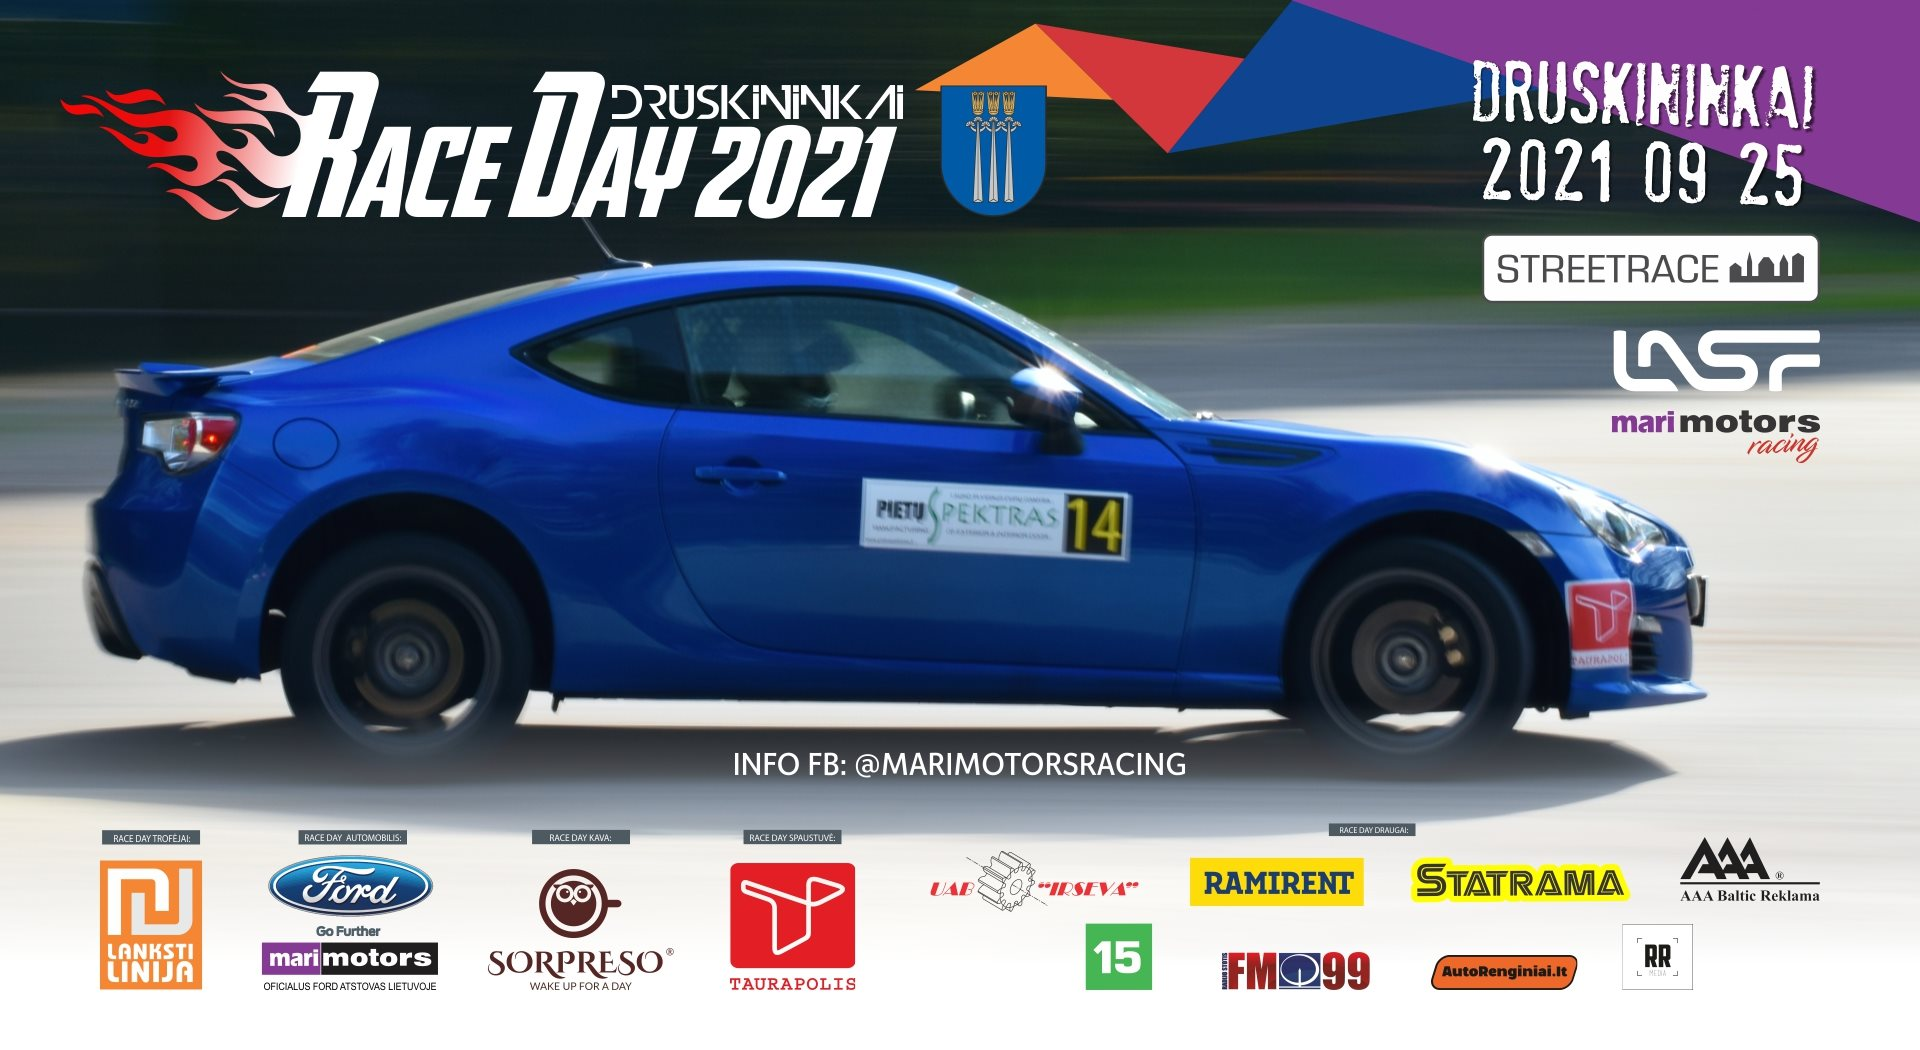 Race Day Druskininkai 2021